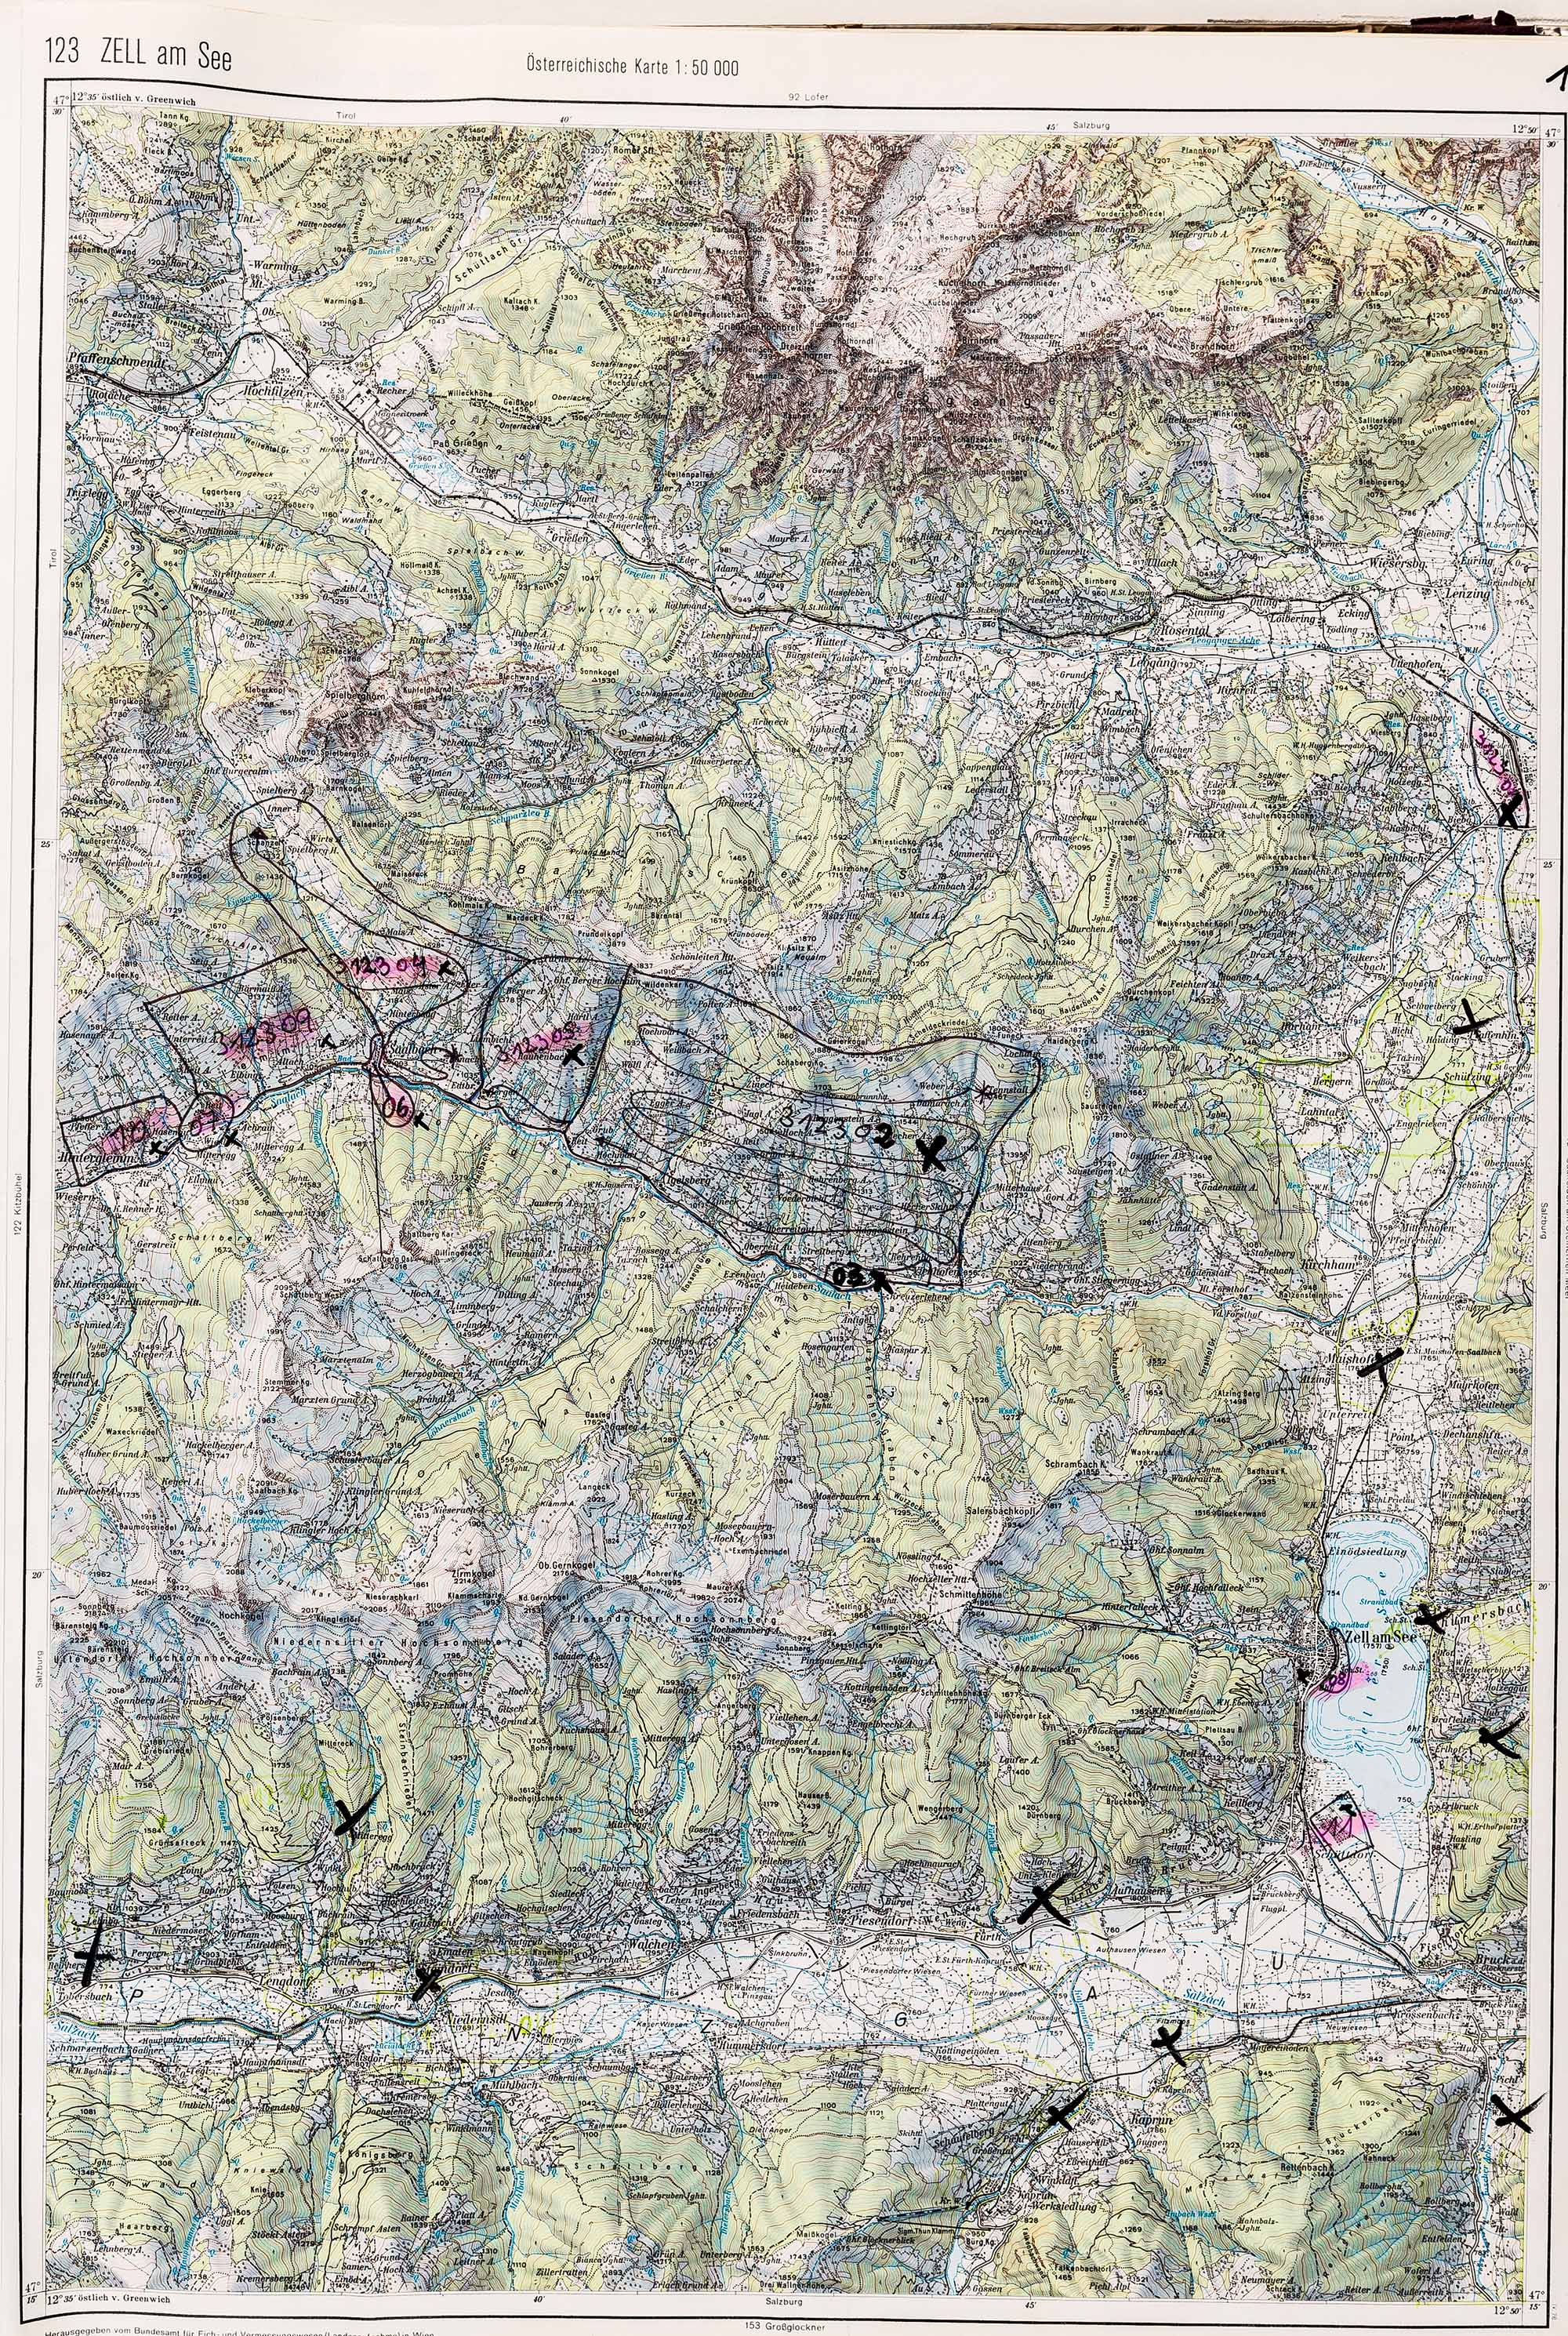 1983-1986 Karte 123